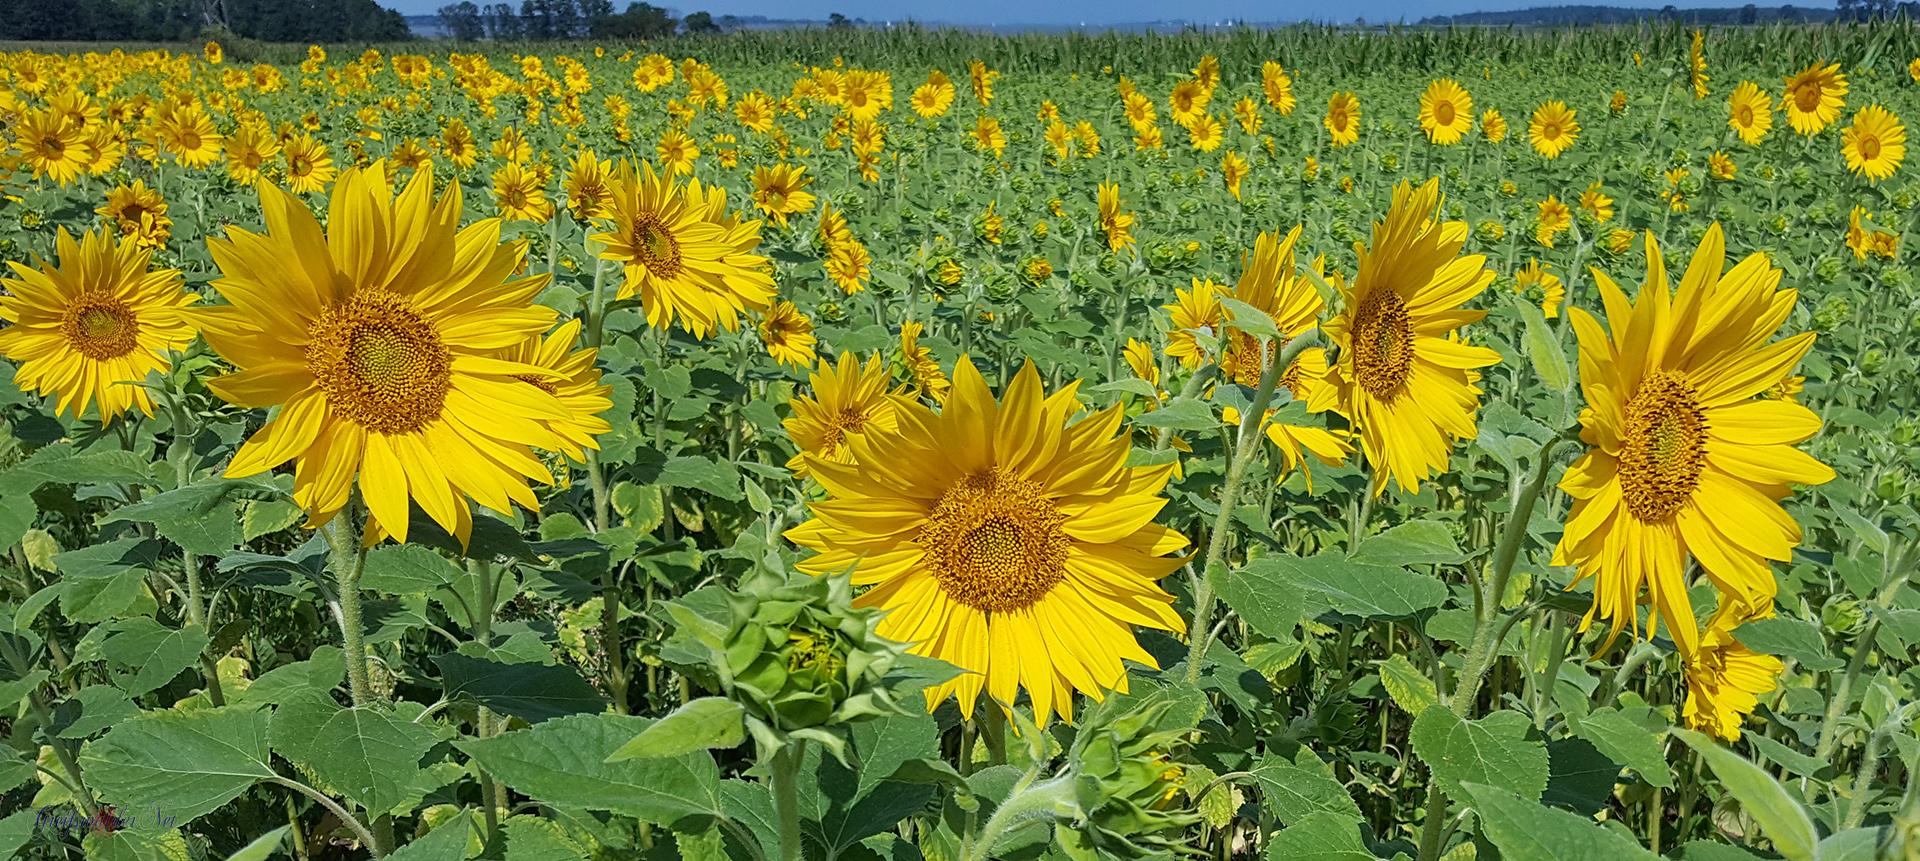 Sonnenblumenfeld Sonnenblume